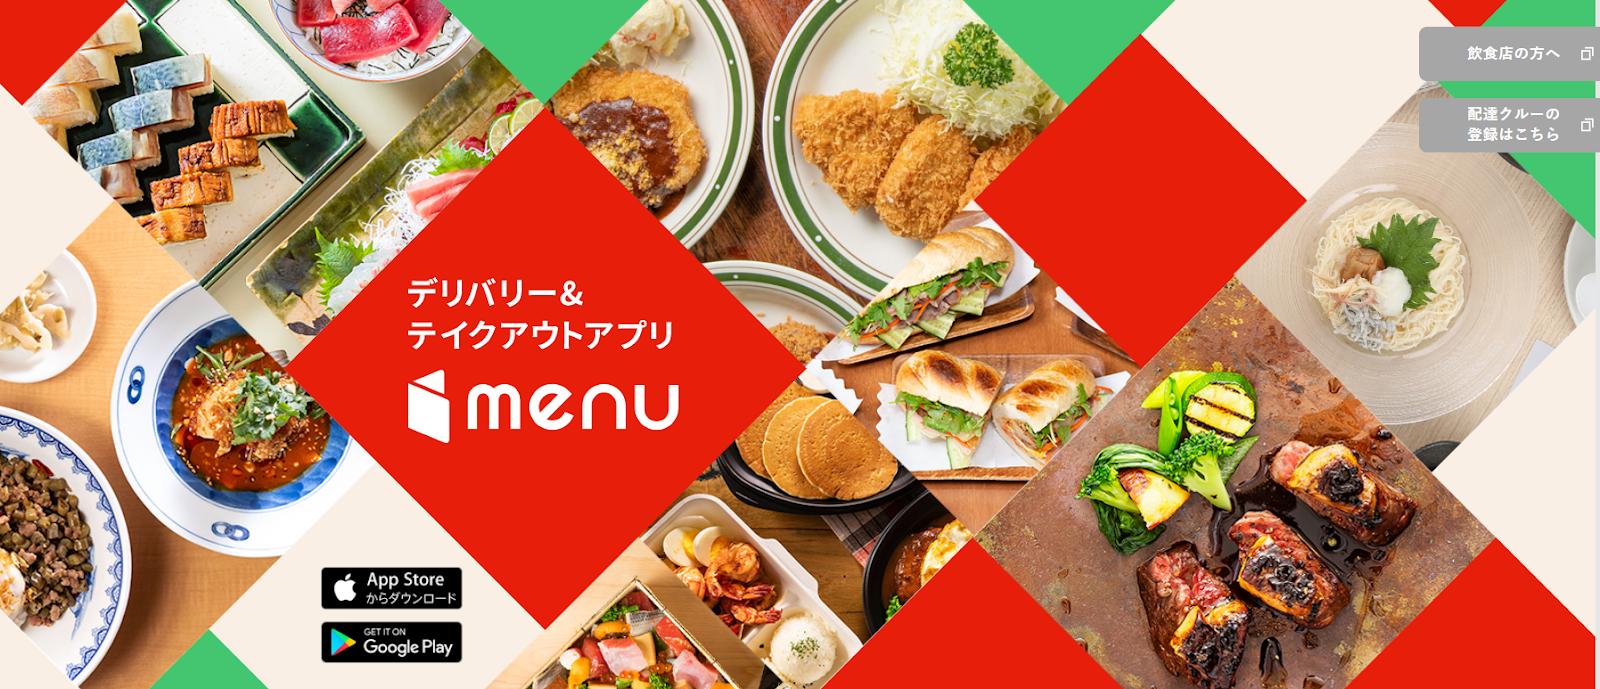 menuとは